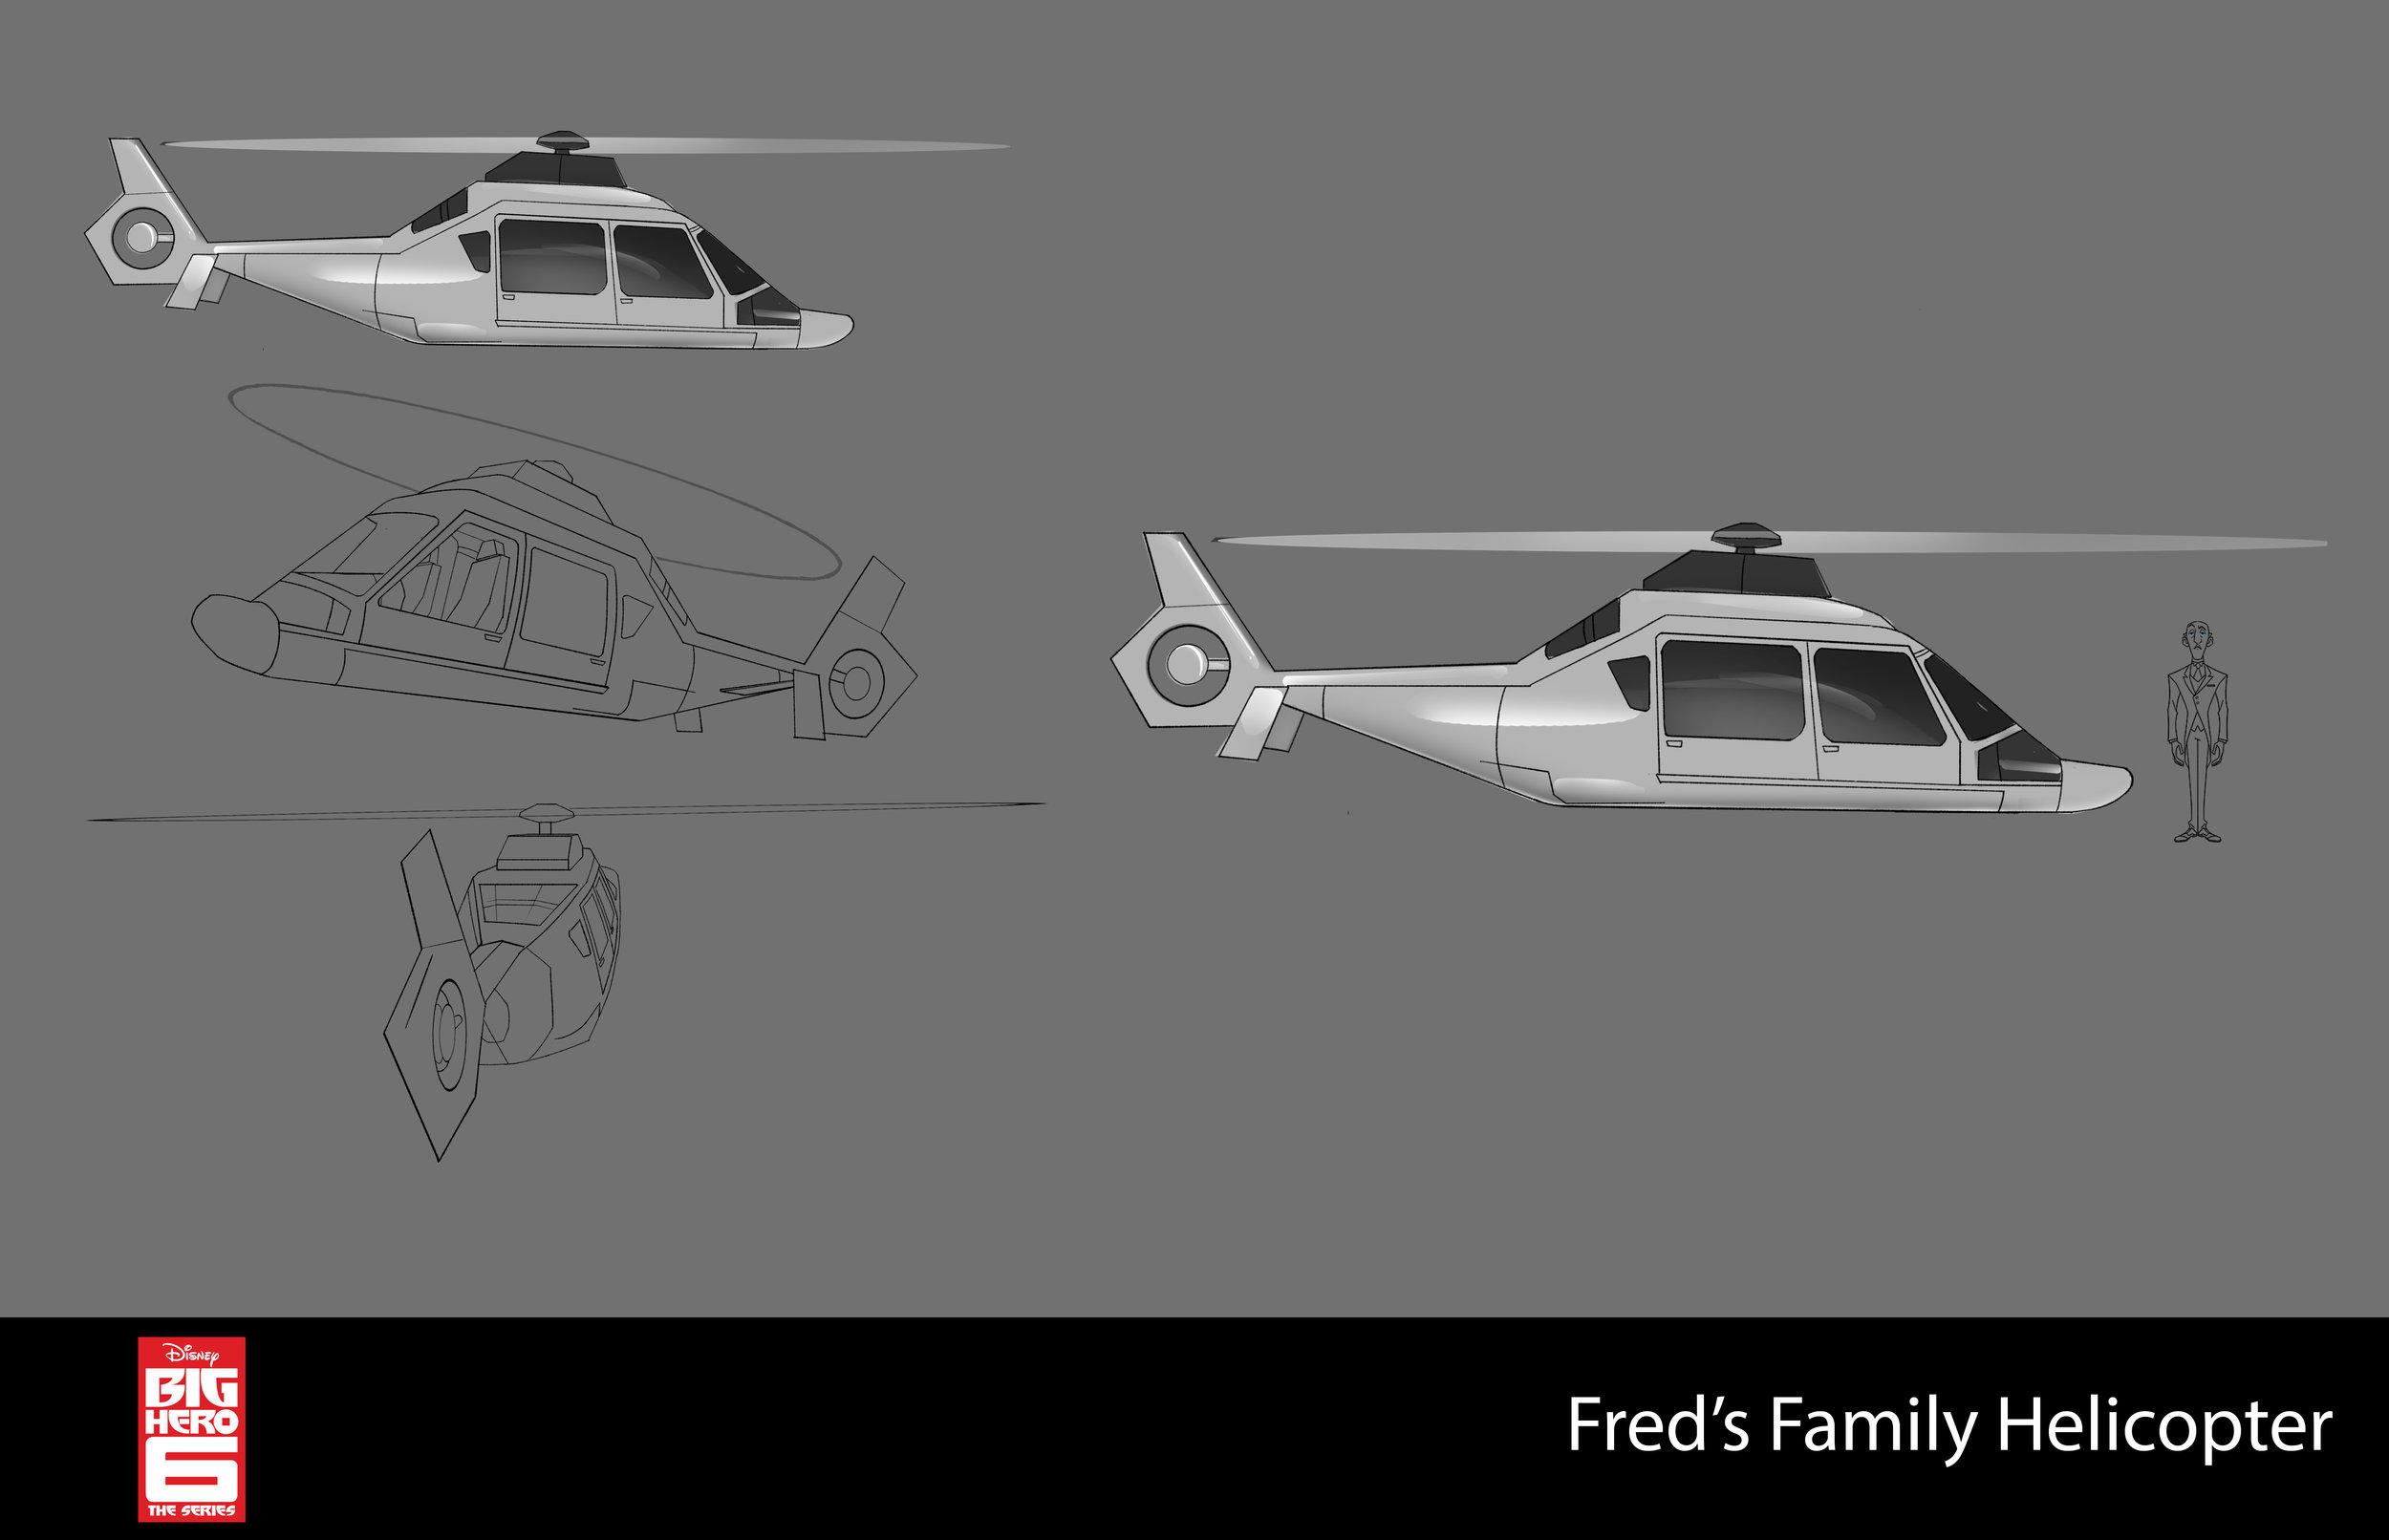 106_FredsFamilyHelicopter_R_V01_BS.jpg